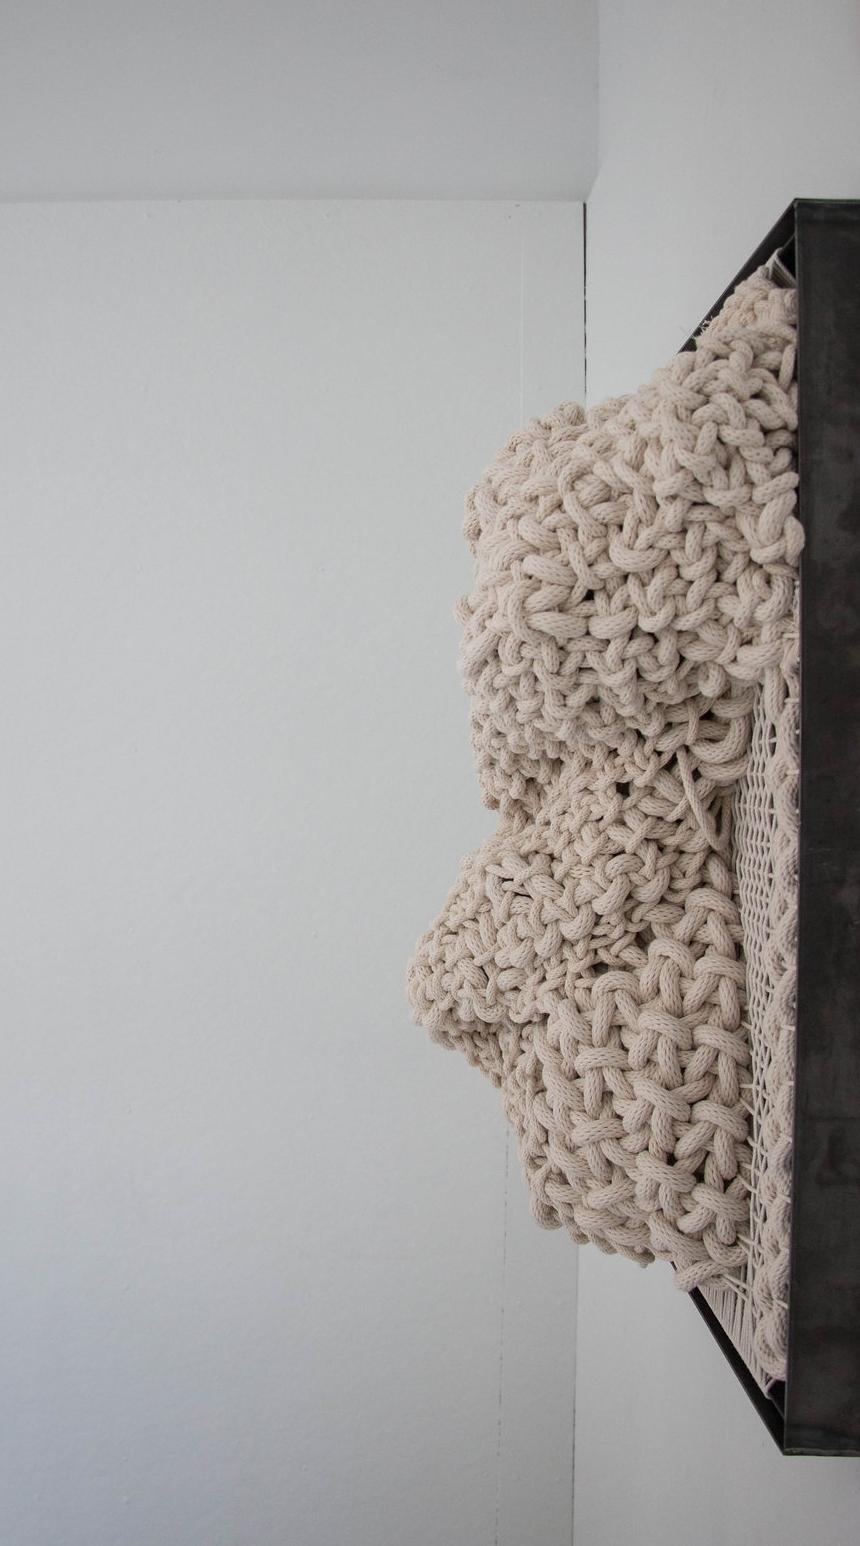 Jacqueline-Surdell-Artist-Sculpture-Lets-Be-Stars-03.jpg